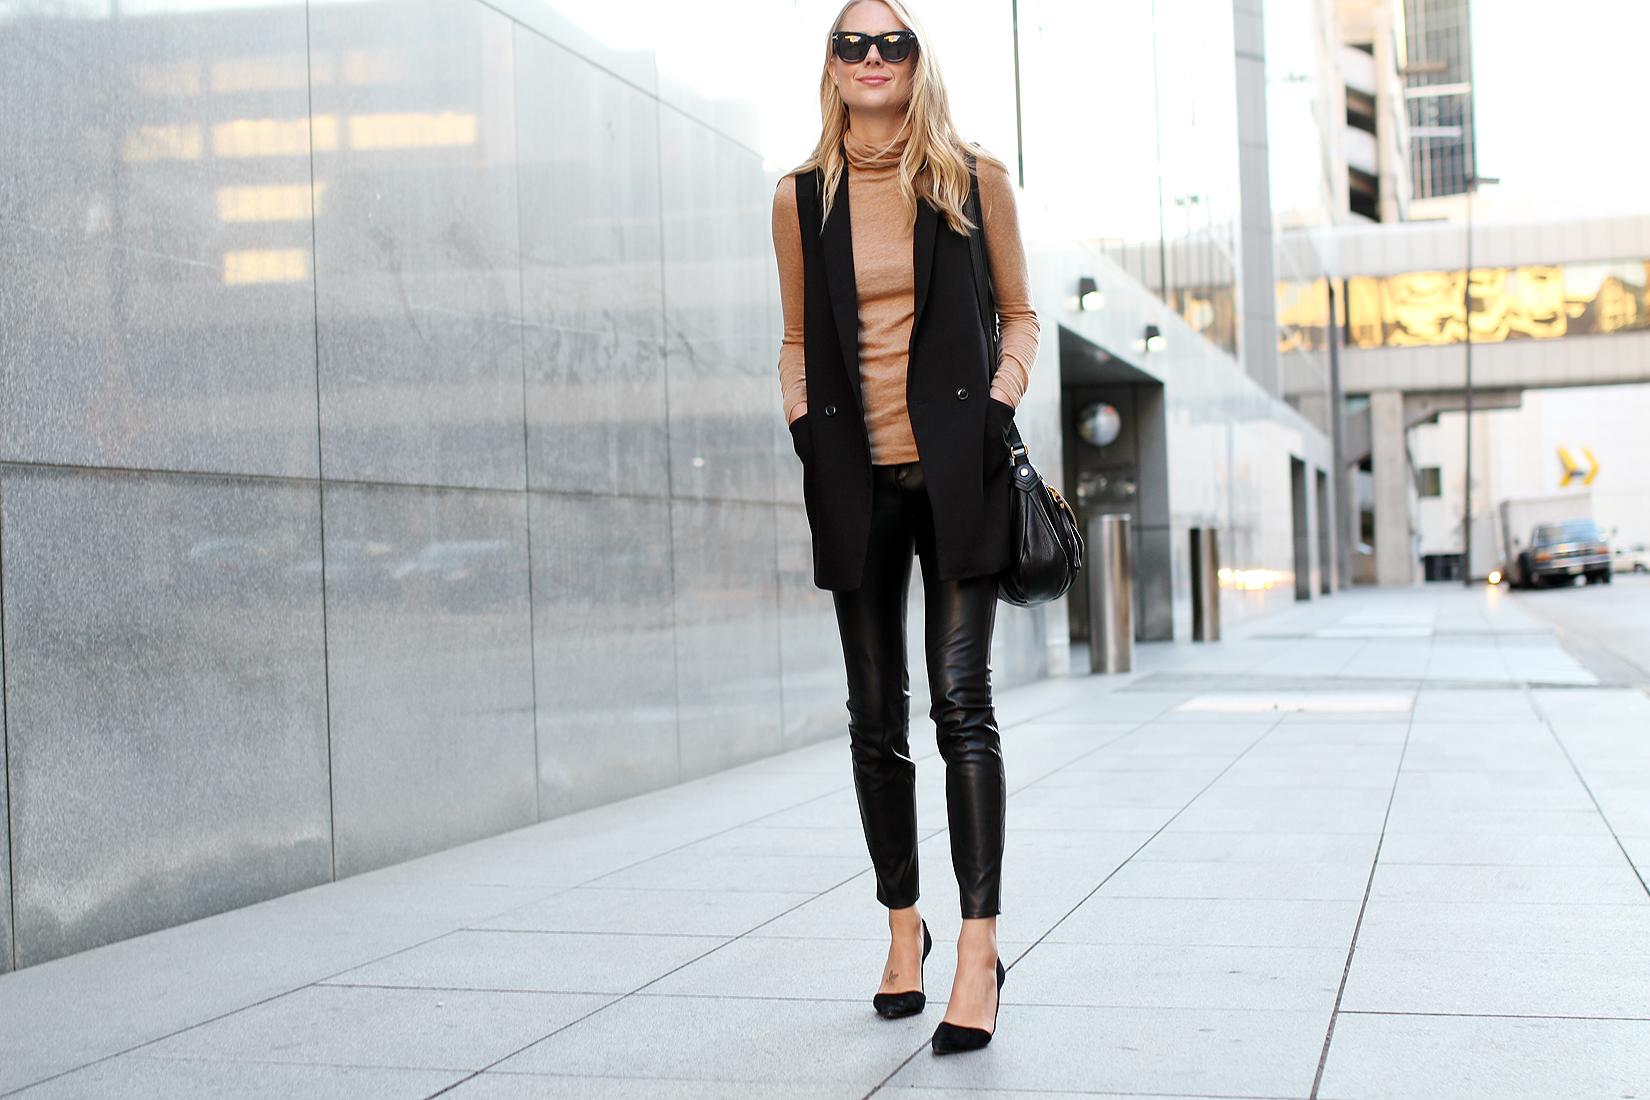 fashion-jackson-madewell-camel-turtleneck-black-long-vest-black-faux-leather-skinny-pants-black-suede-pumps